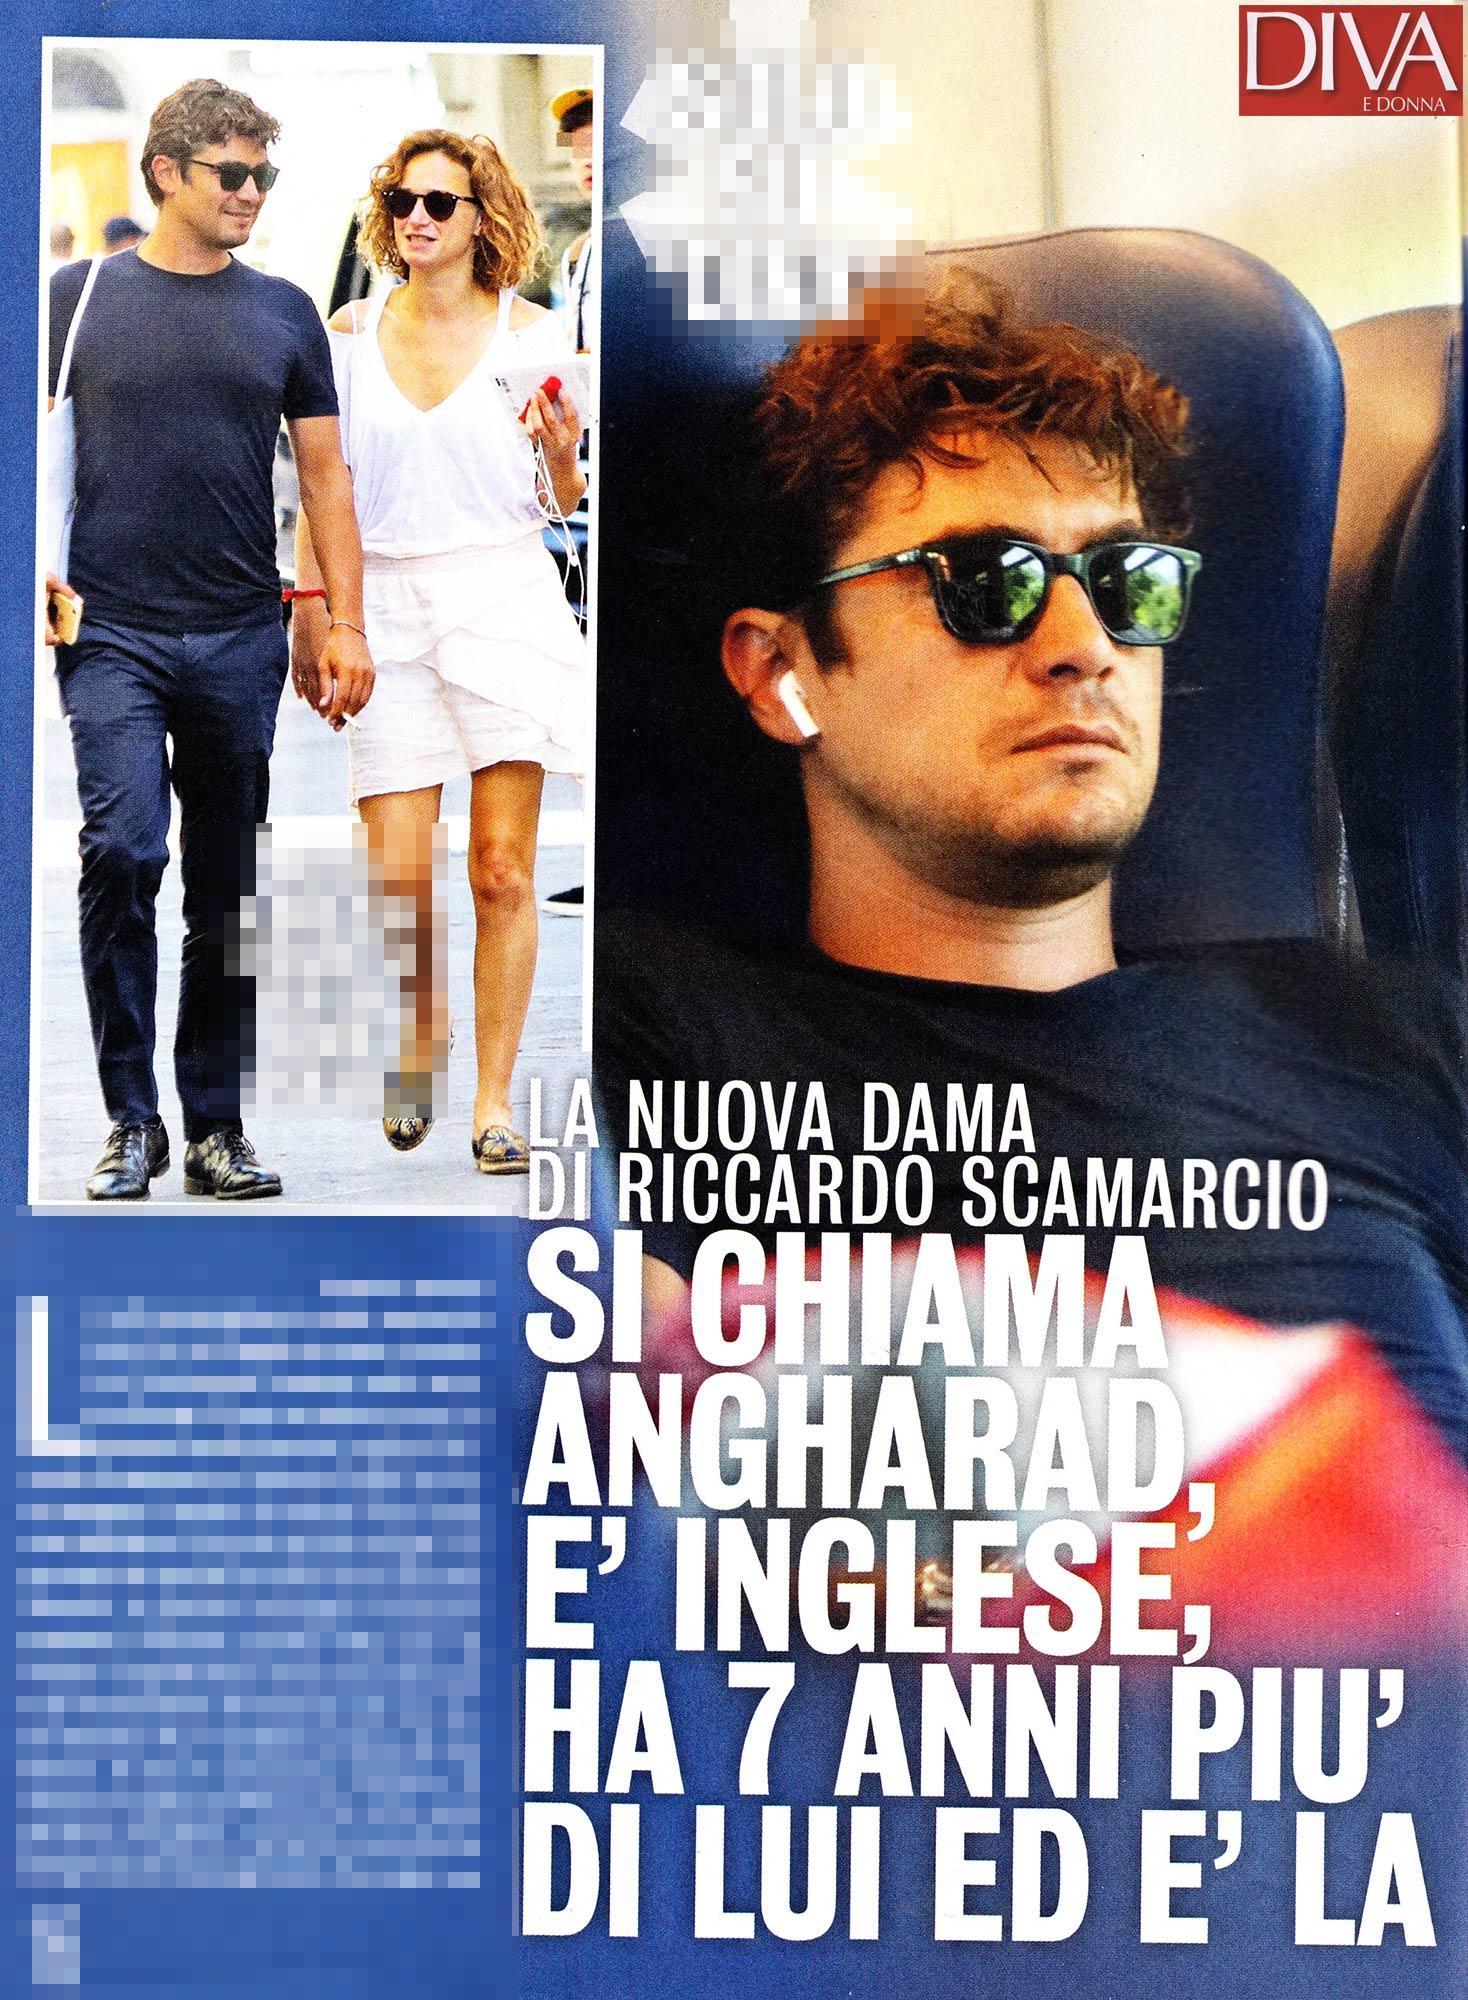 Riccardo Scamarcio, ecco la nuova fiamma Angharad